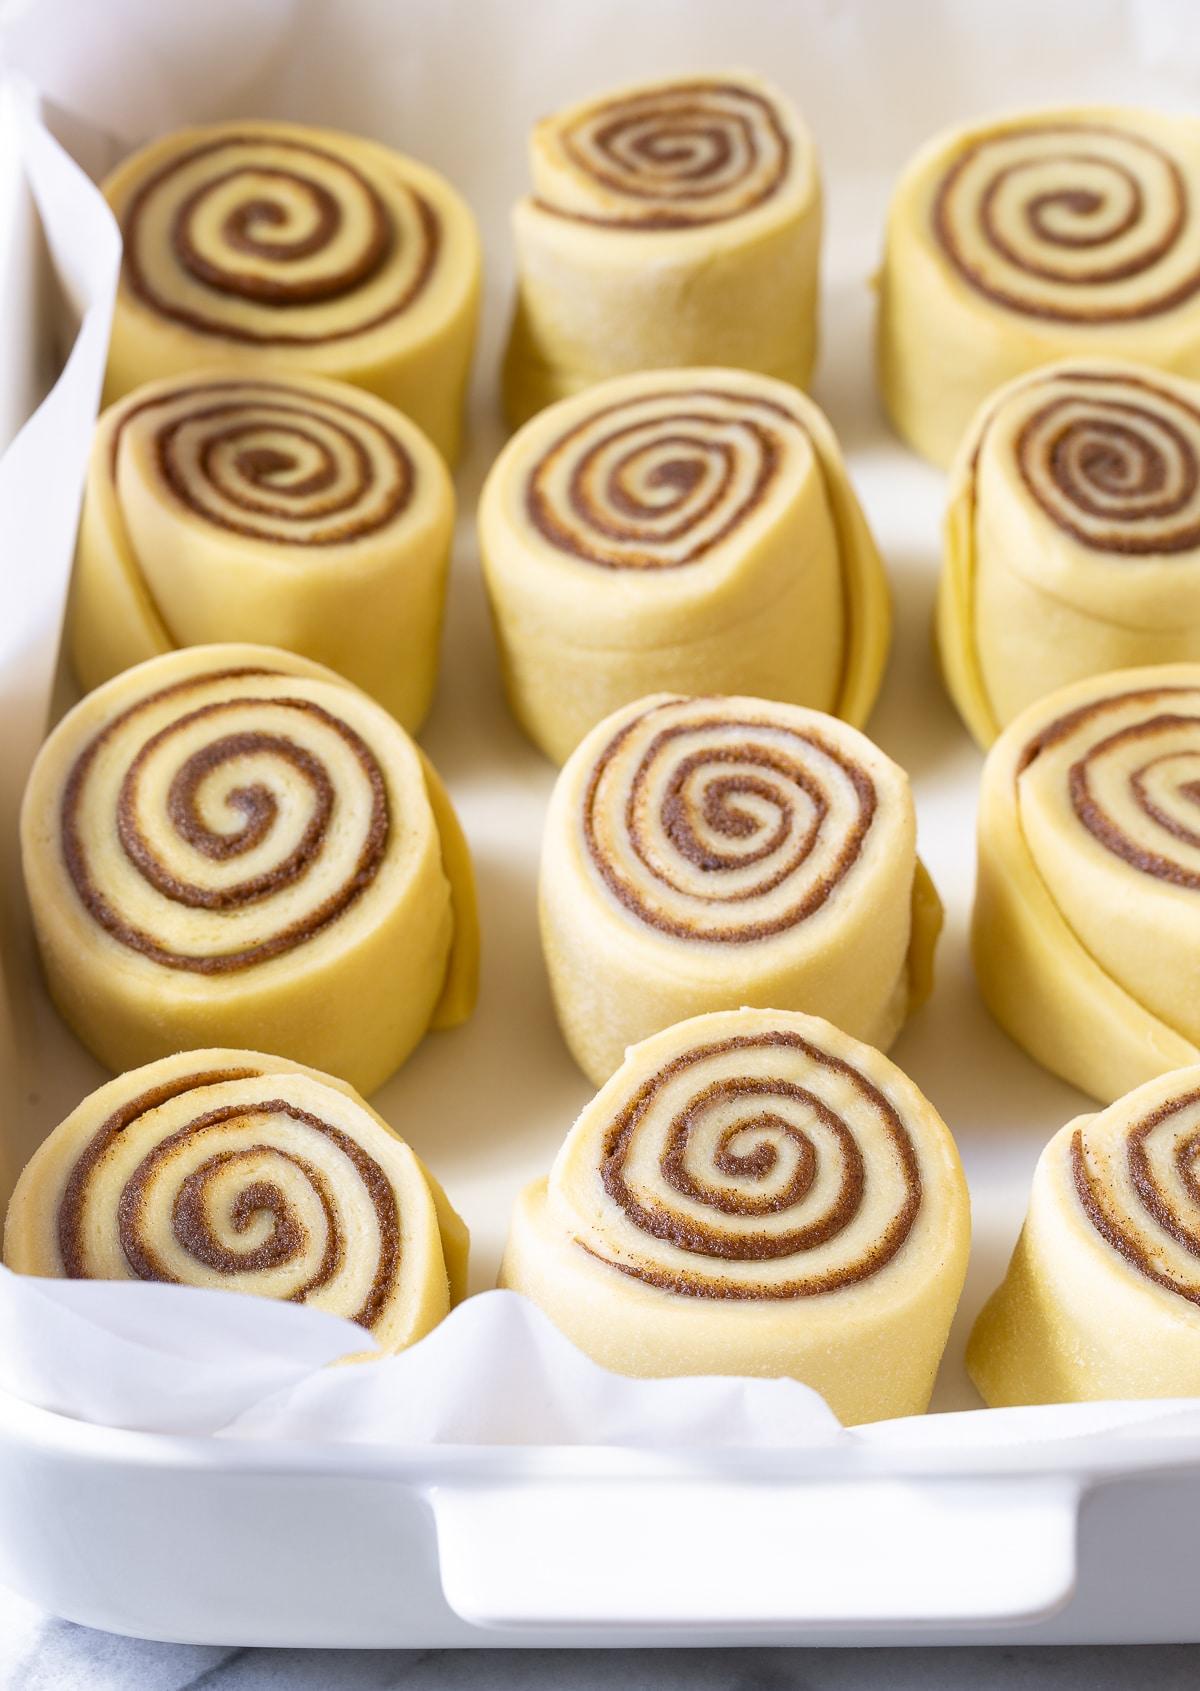 Homemade Cinnamon Rolls #ASpicyPerspective #CinnamonRolls #CinnamonRollRecipe #HowtoMakeCinnamonRolls #Cinnabon #Dessert #Breakfast #Cinnamon #Homemade